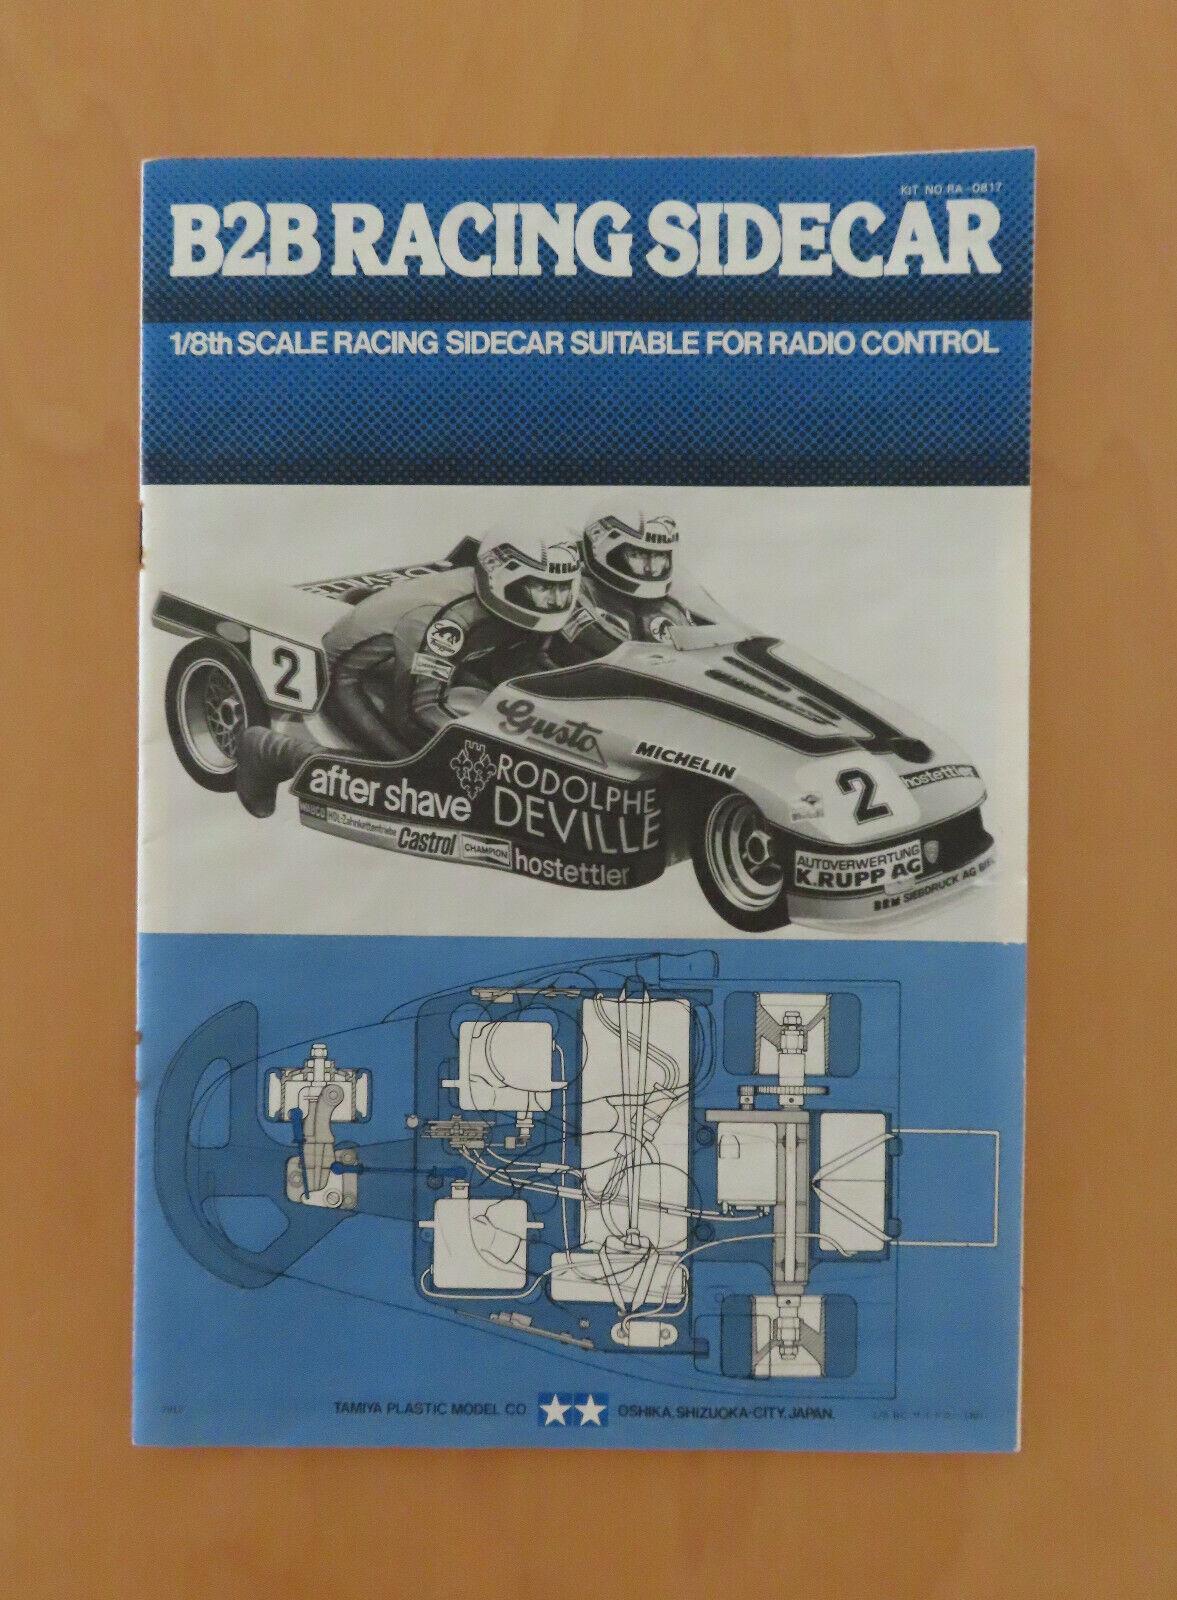 RC Tamiya uomoUALE B2B Racing Sideauto 58017, RA0817  NUOVO 1979  ordina ora i prezzi più bassi